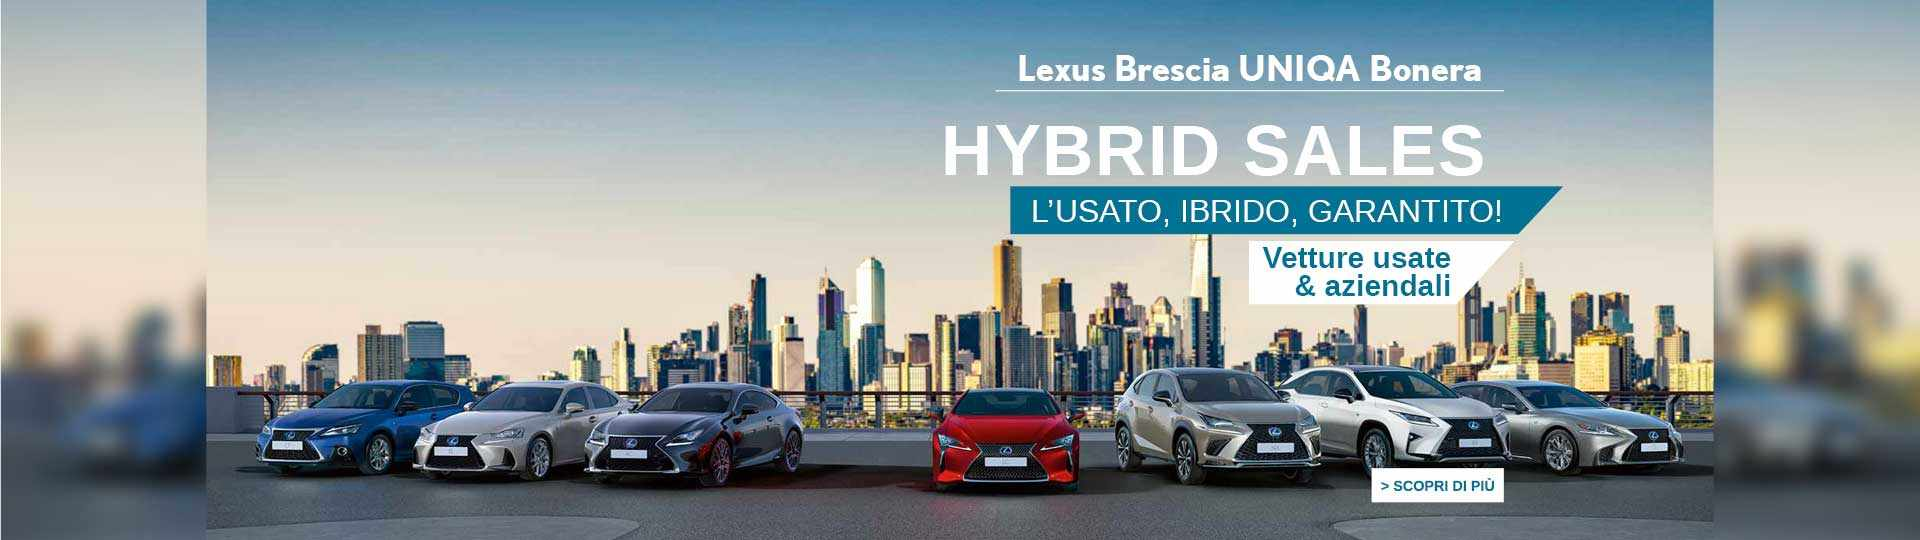 Lexus-usato-garantito-min2.jpg